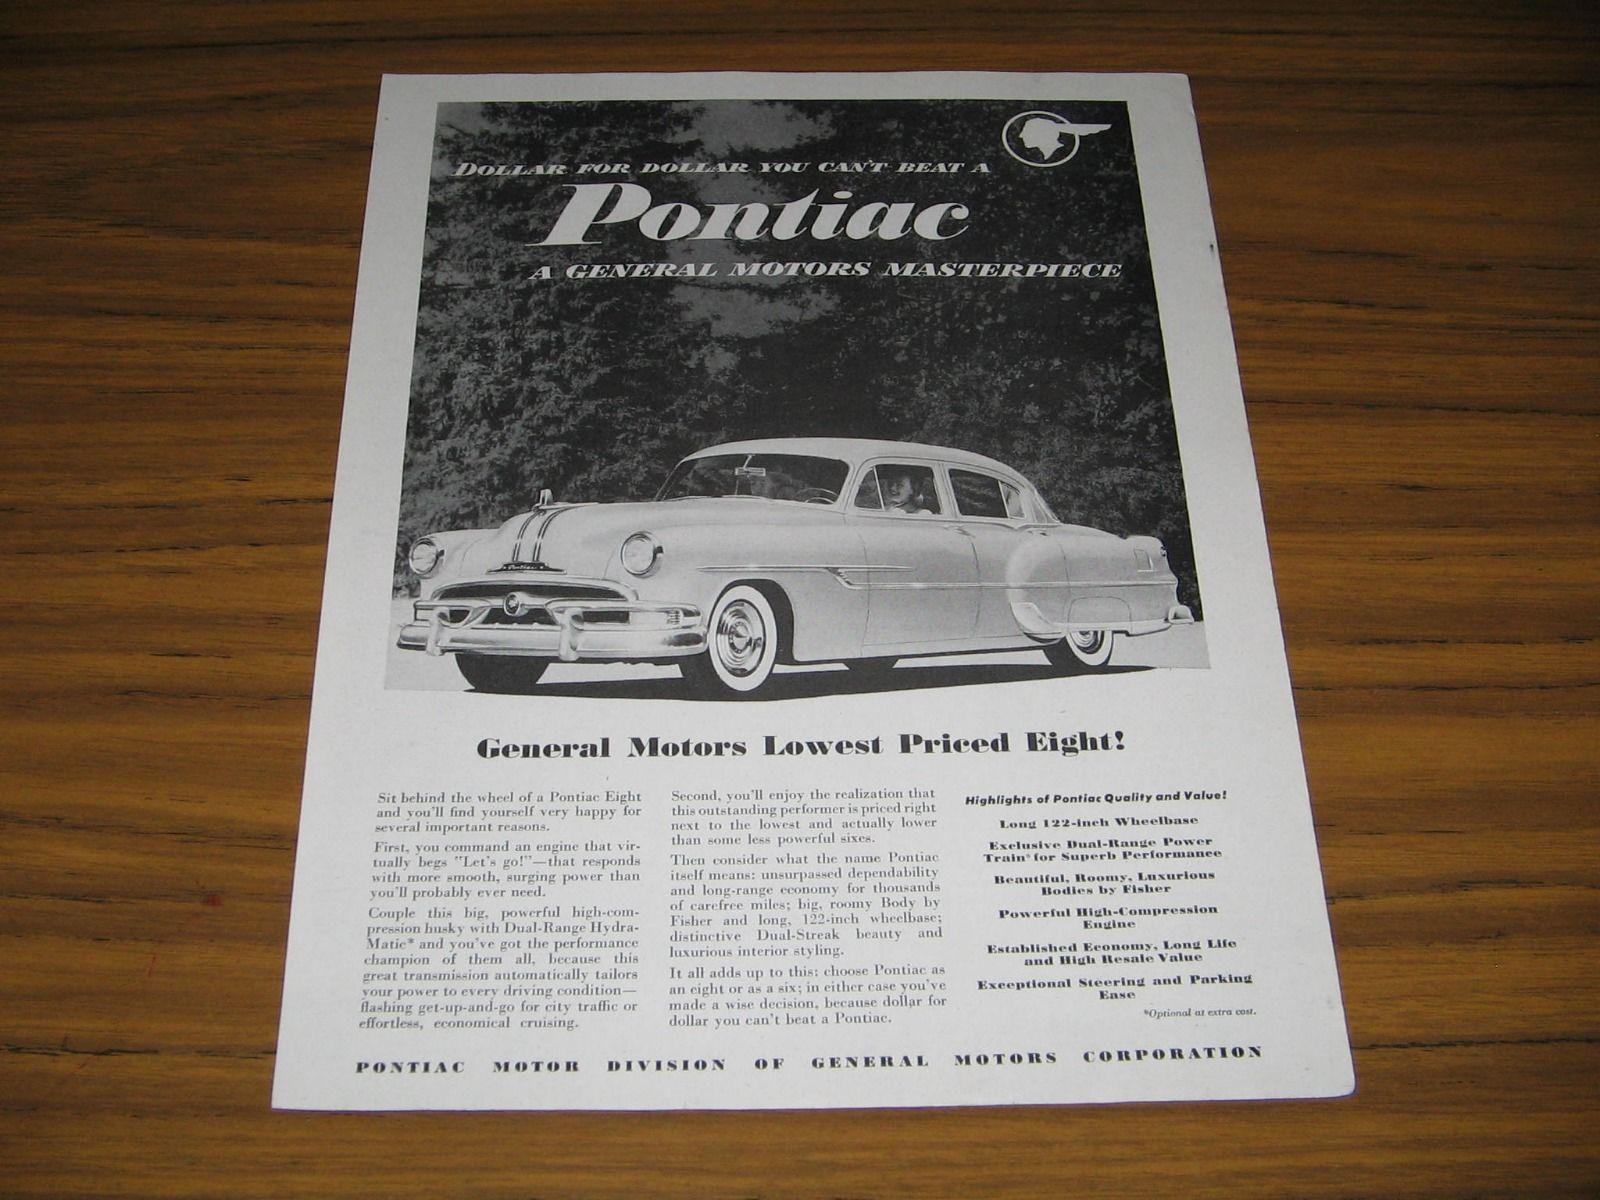 Pontiac Print Ad 1950s 11 Listings 1950 Star Chief 1953 4 Door Car With V 8 General Motors Masterpiece 1415